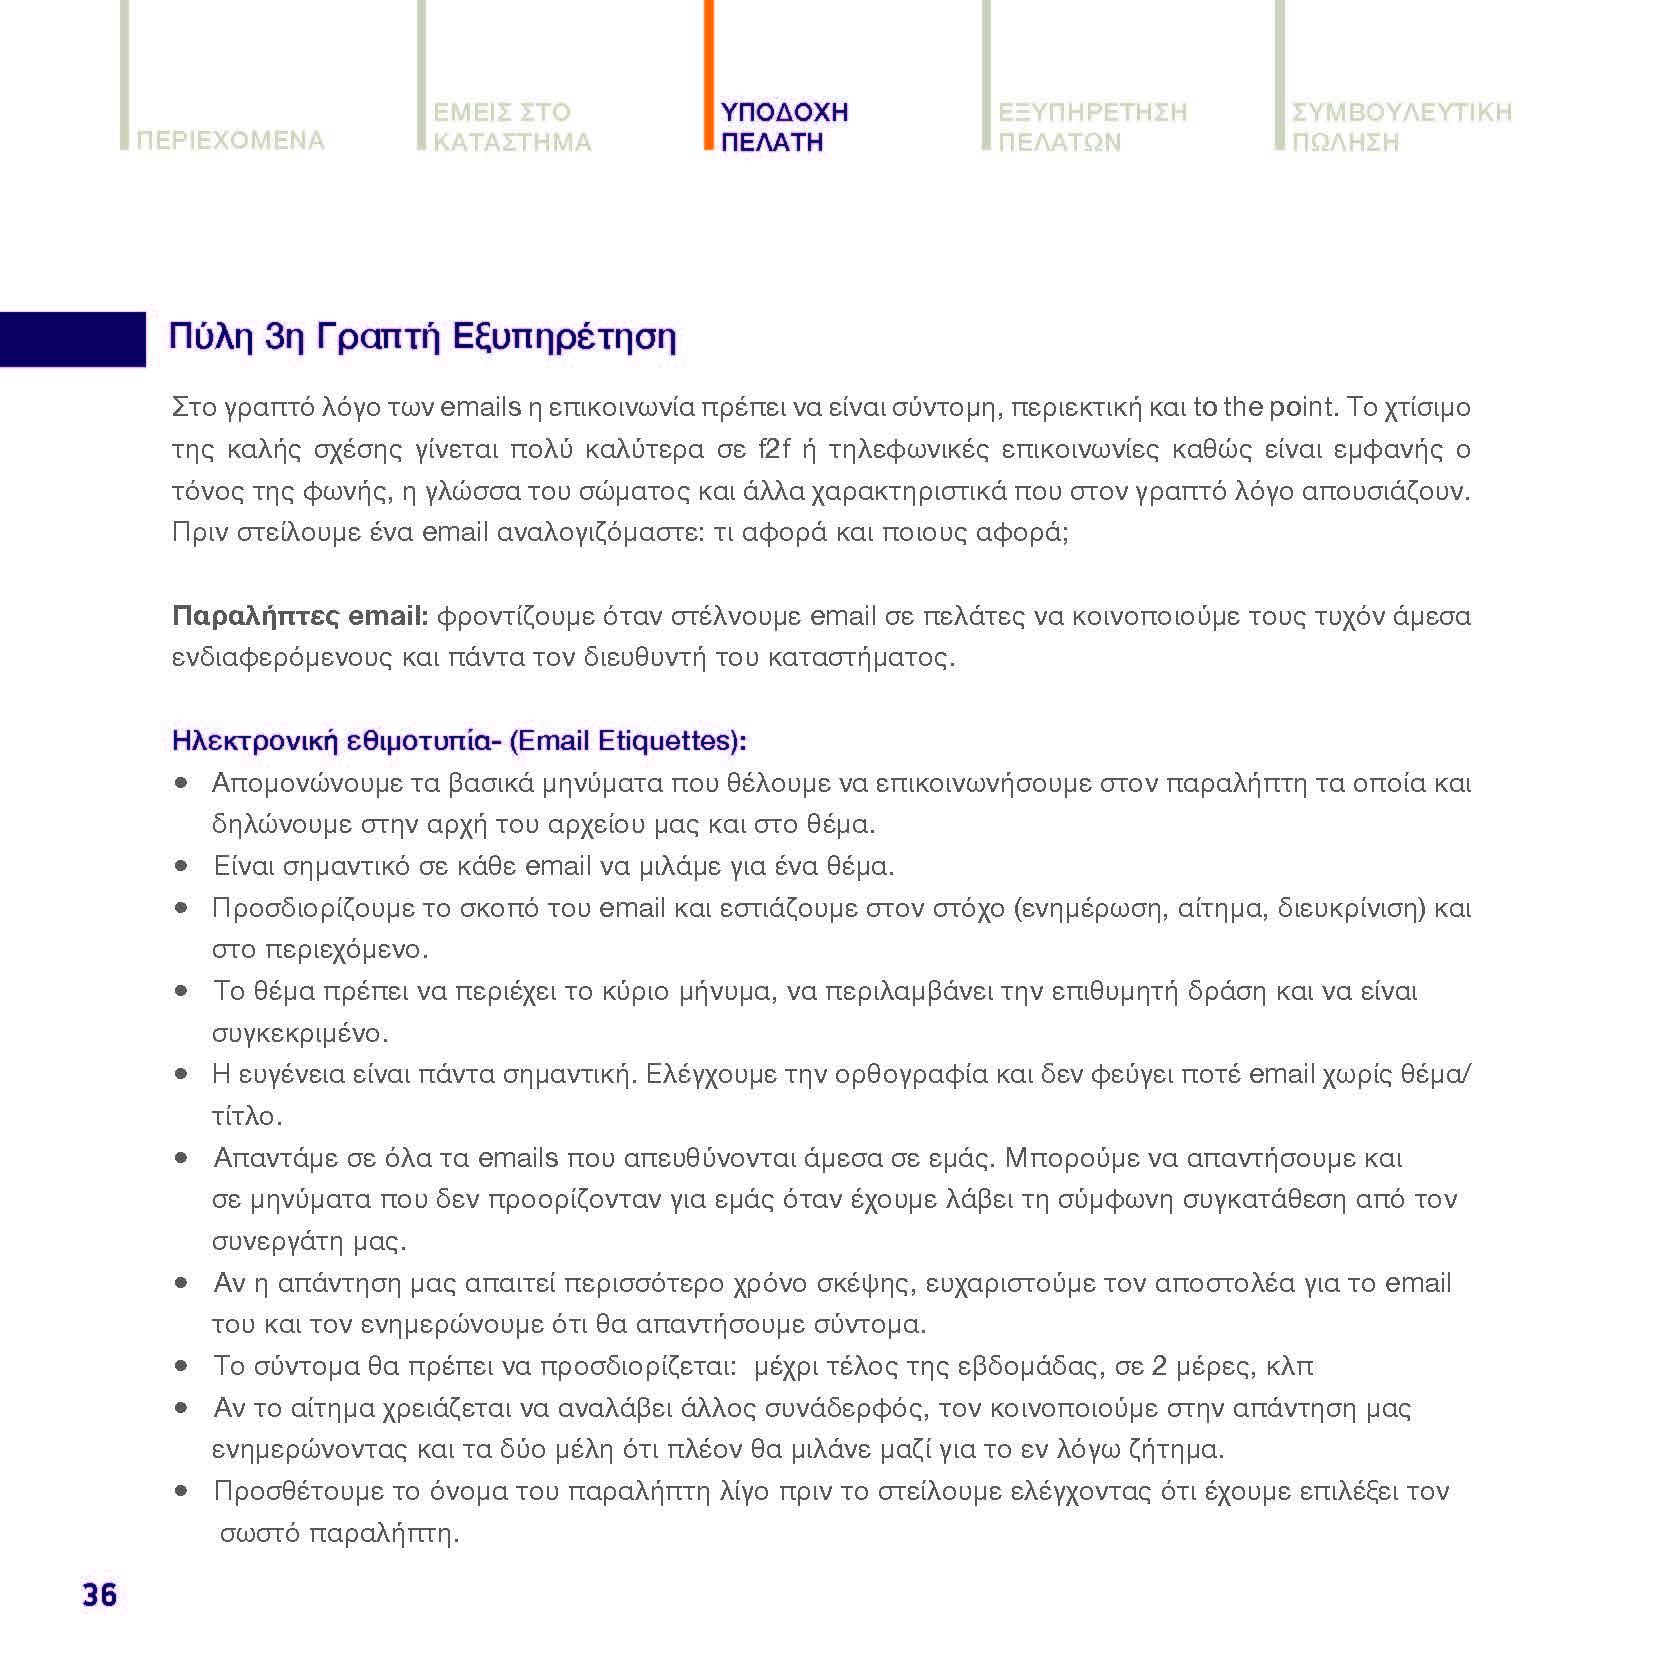 https://www.jib.gr/wp-content/uploads/2020/09/OPTIMA-BANK-BOOKLET-WEB_Page_036.jpg